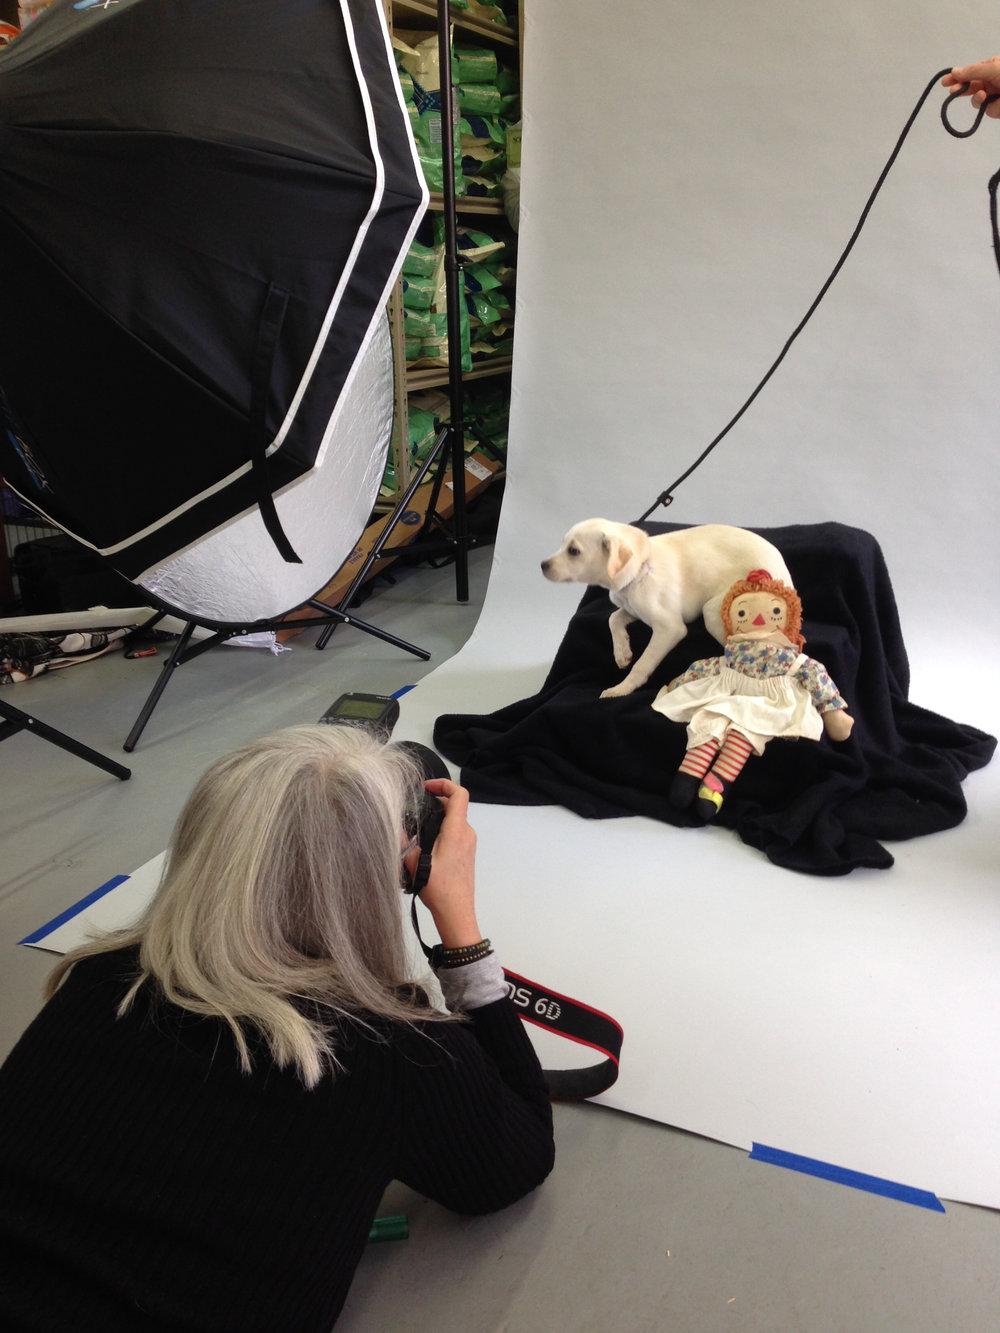 5 COPYRIGHTED MATERIAL DO NOT COPY Source- LIZ GREER DOG PHOTOGRAPHY lizgreer.com.jpg